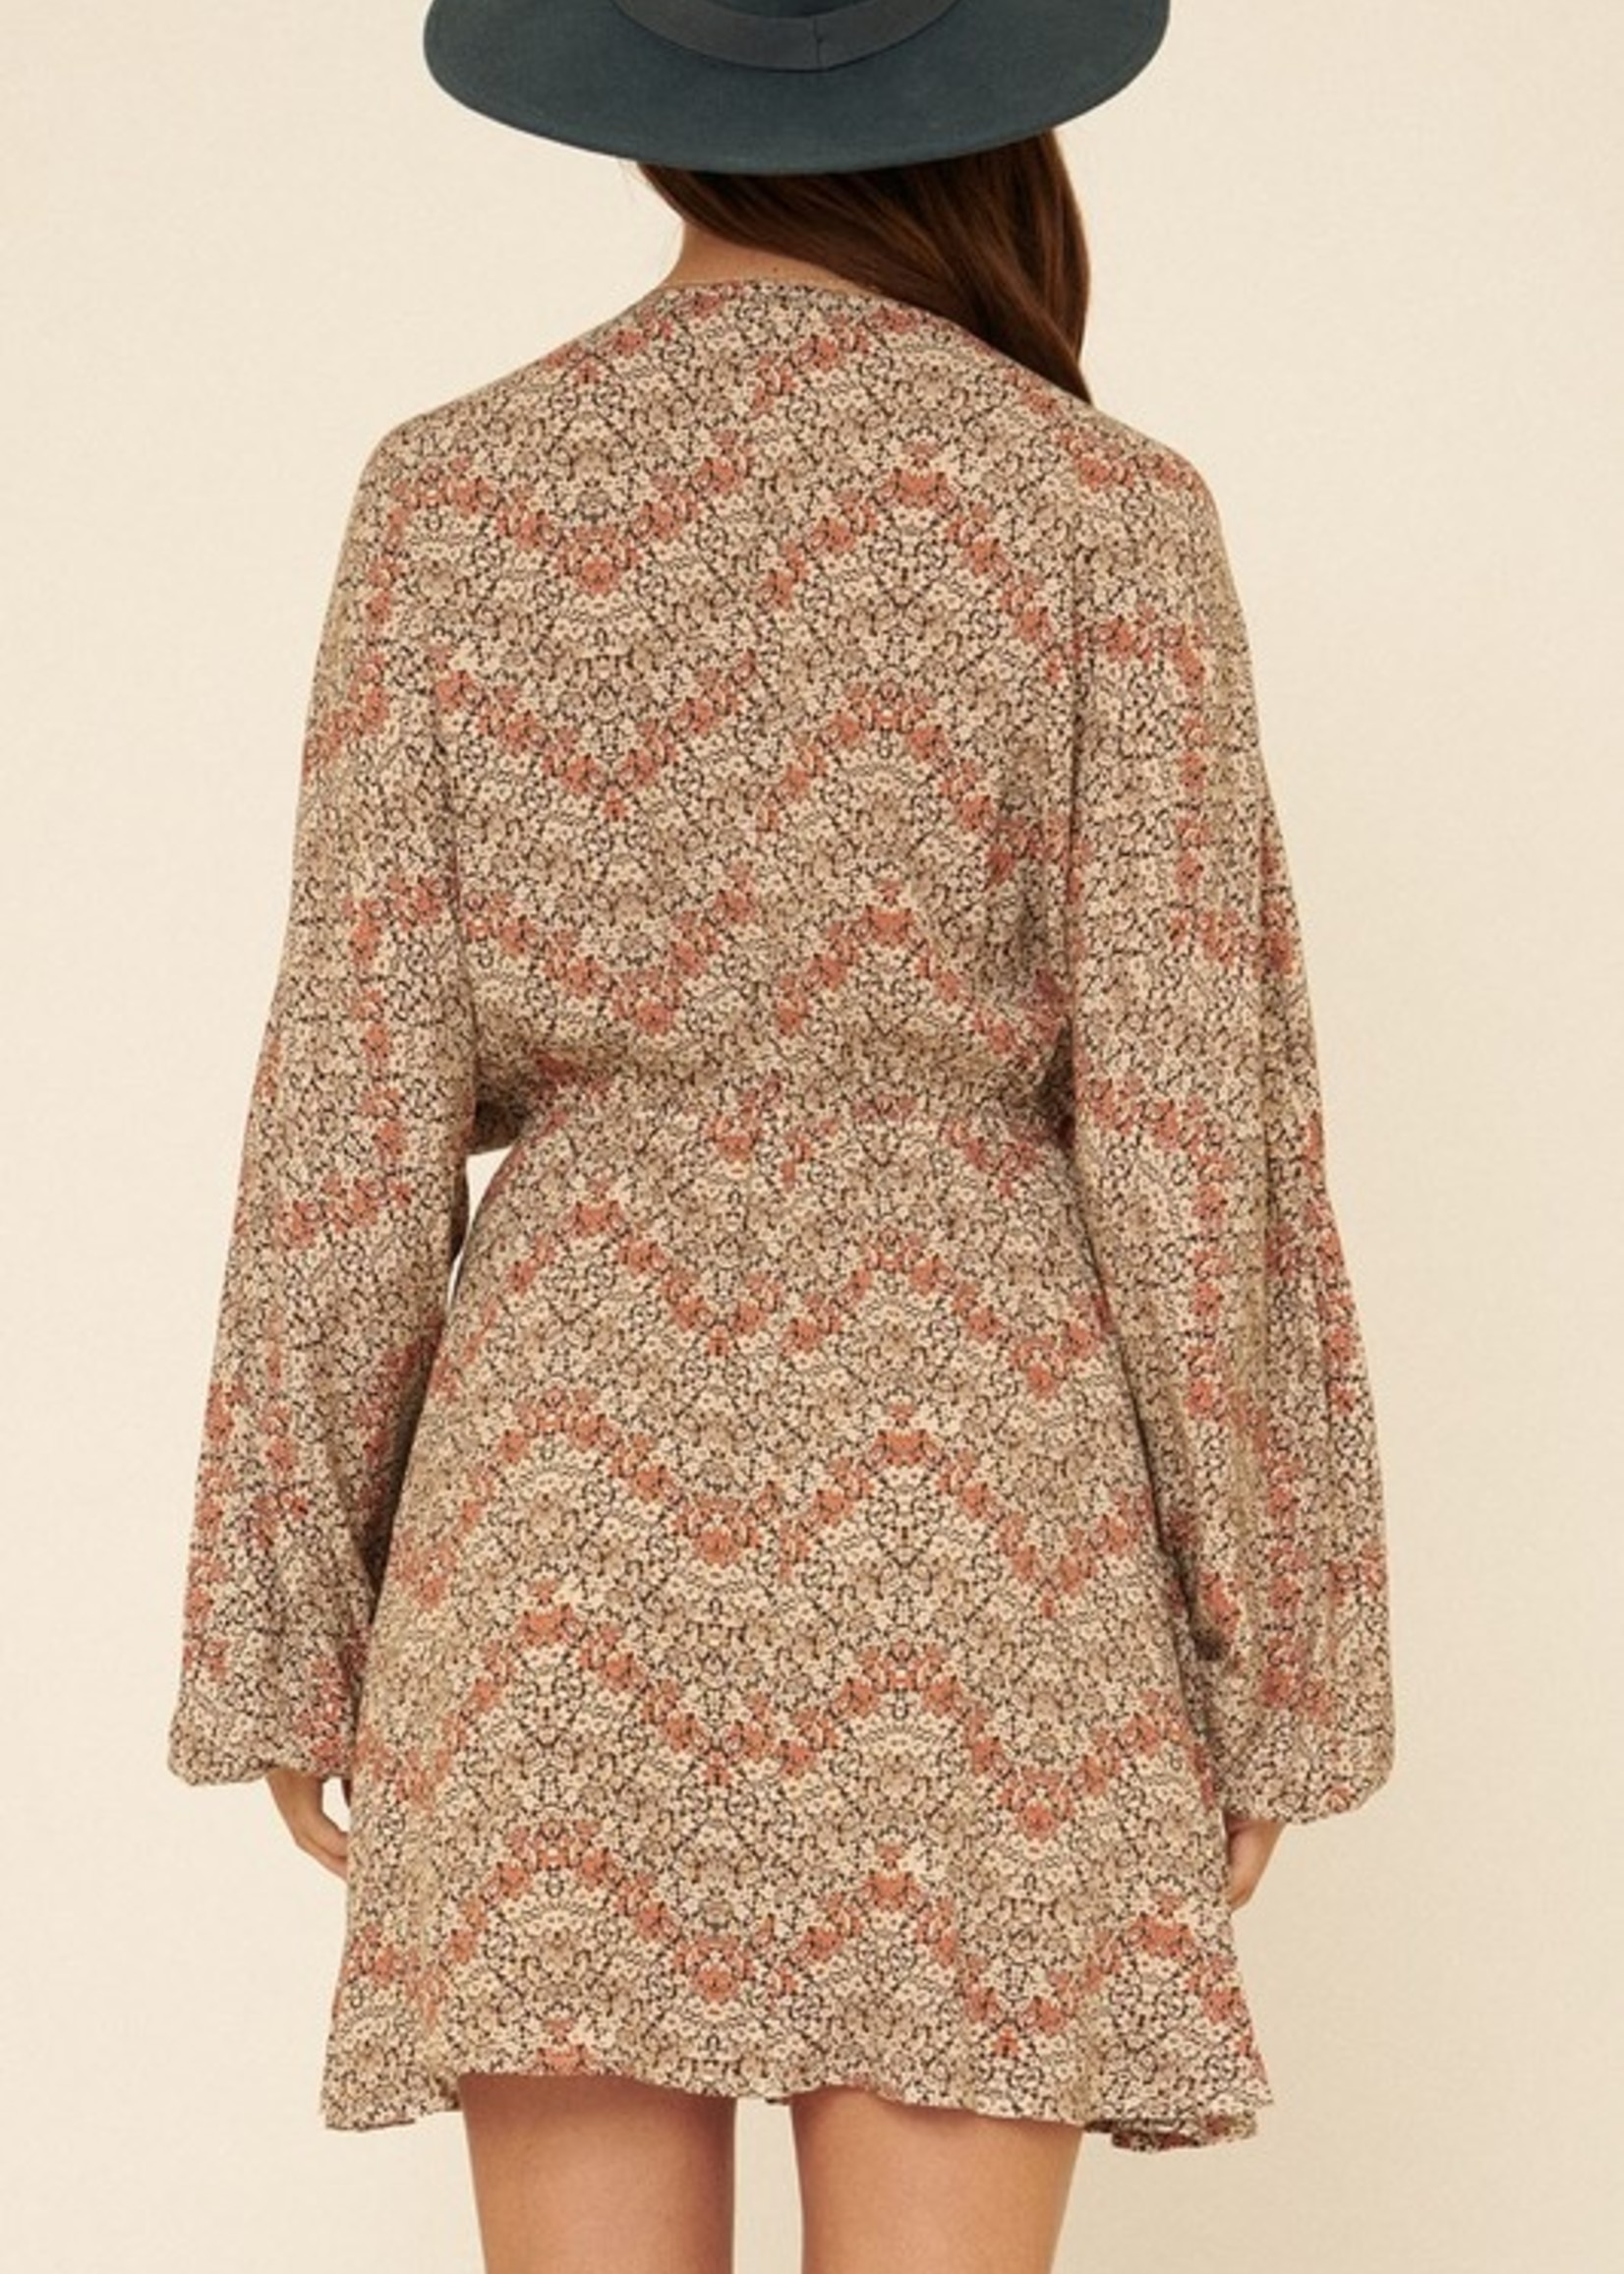 V Neck dress with drawstring - Rust Floral